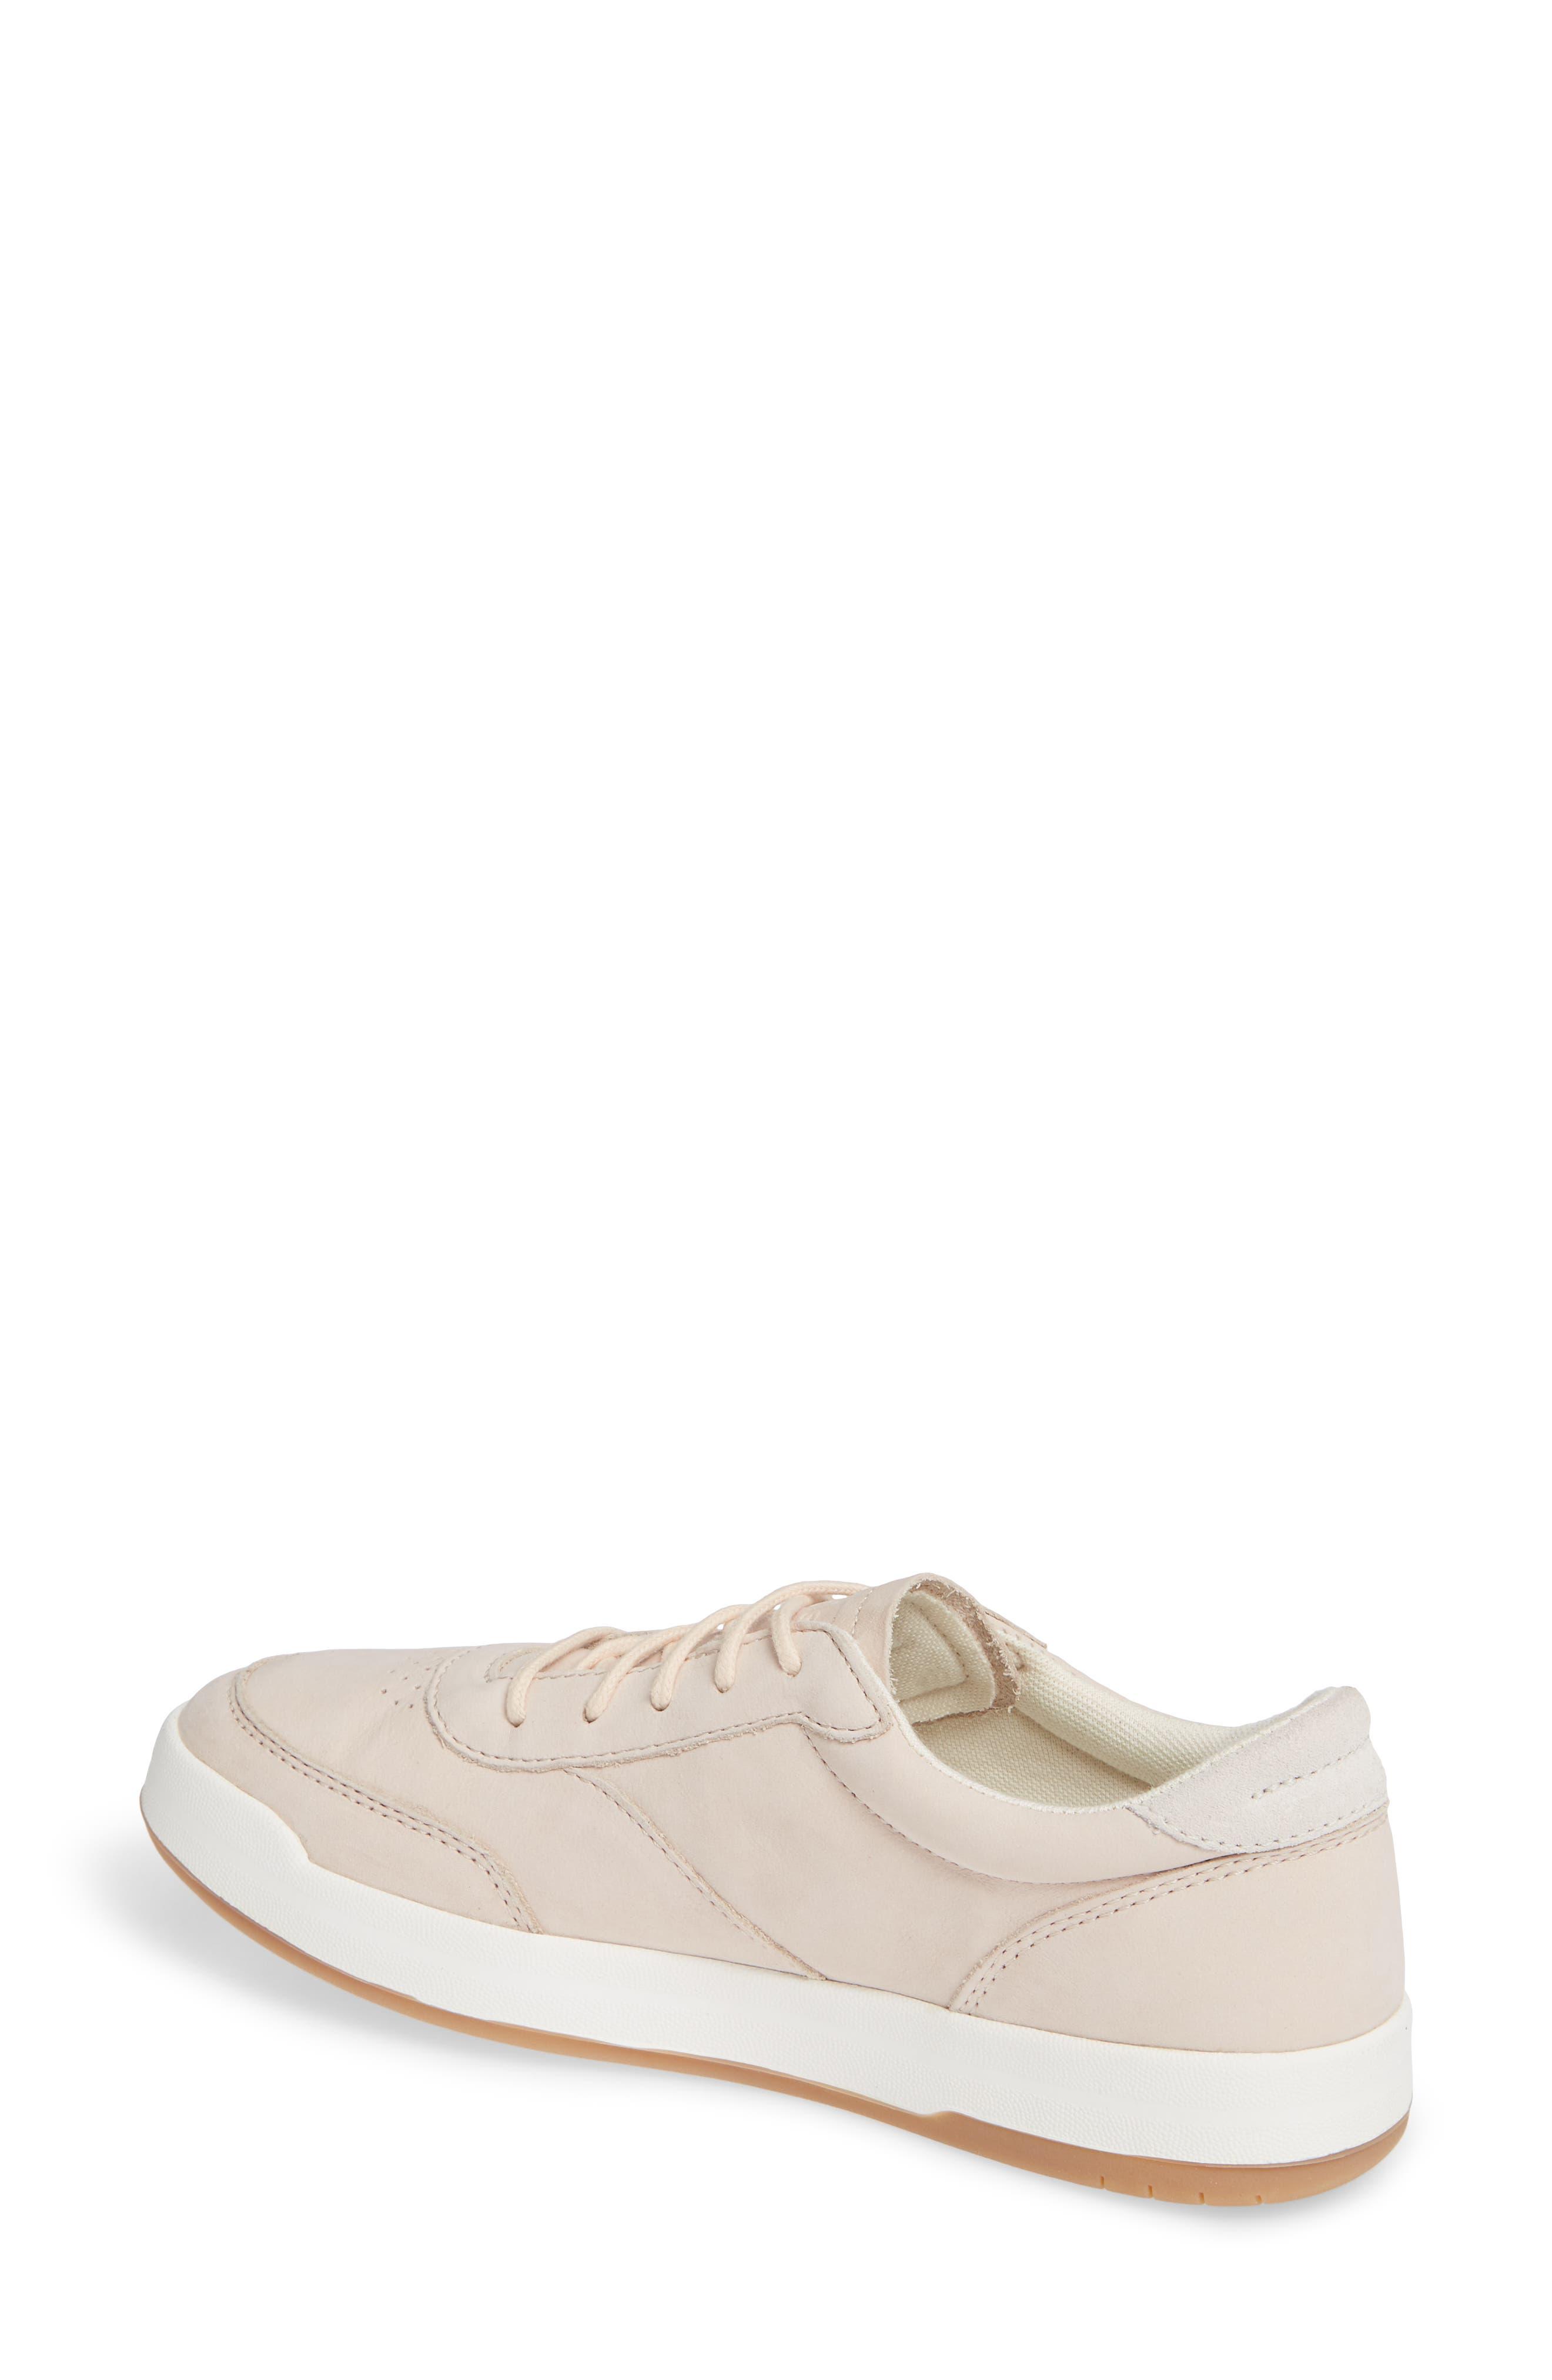 Match Point Sneaker,                             Alternate thumbnail 2, color,                             685